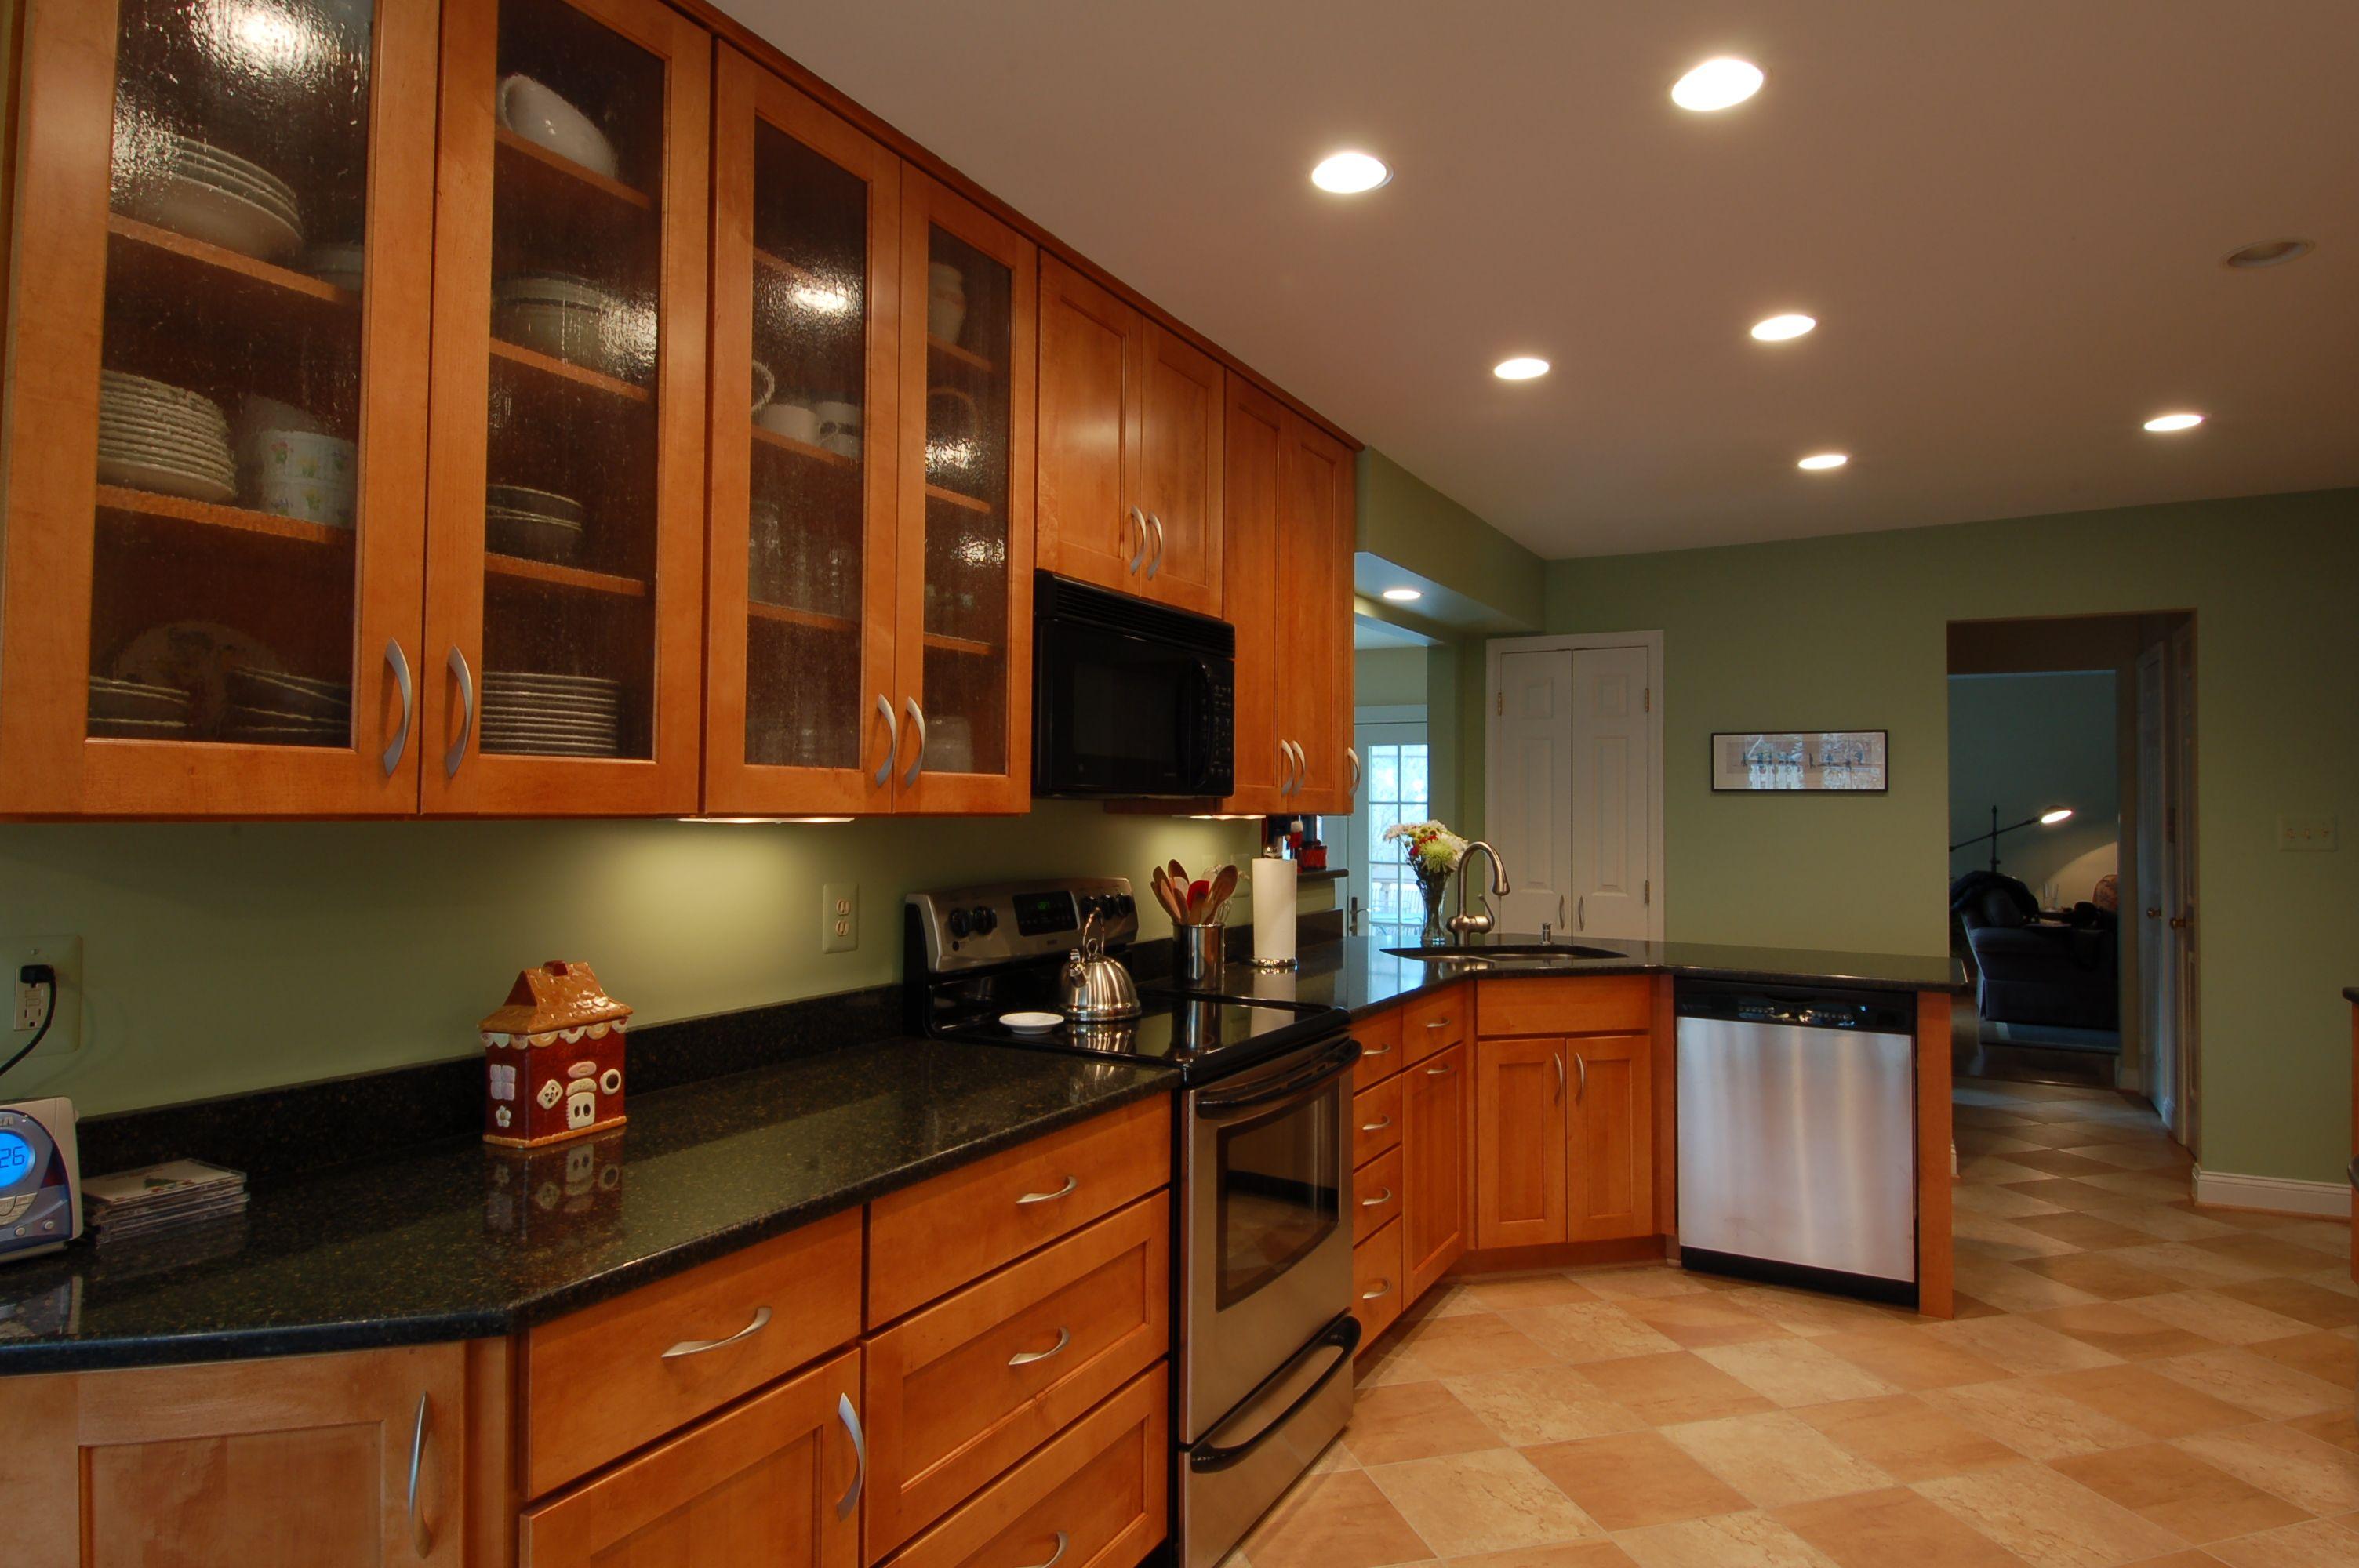 tile kitchen floors pictures Kitchen Flooring Options